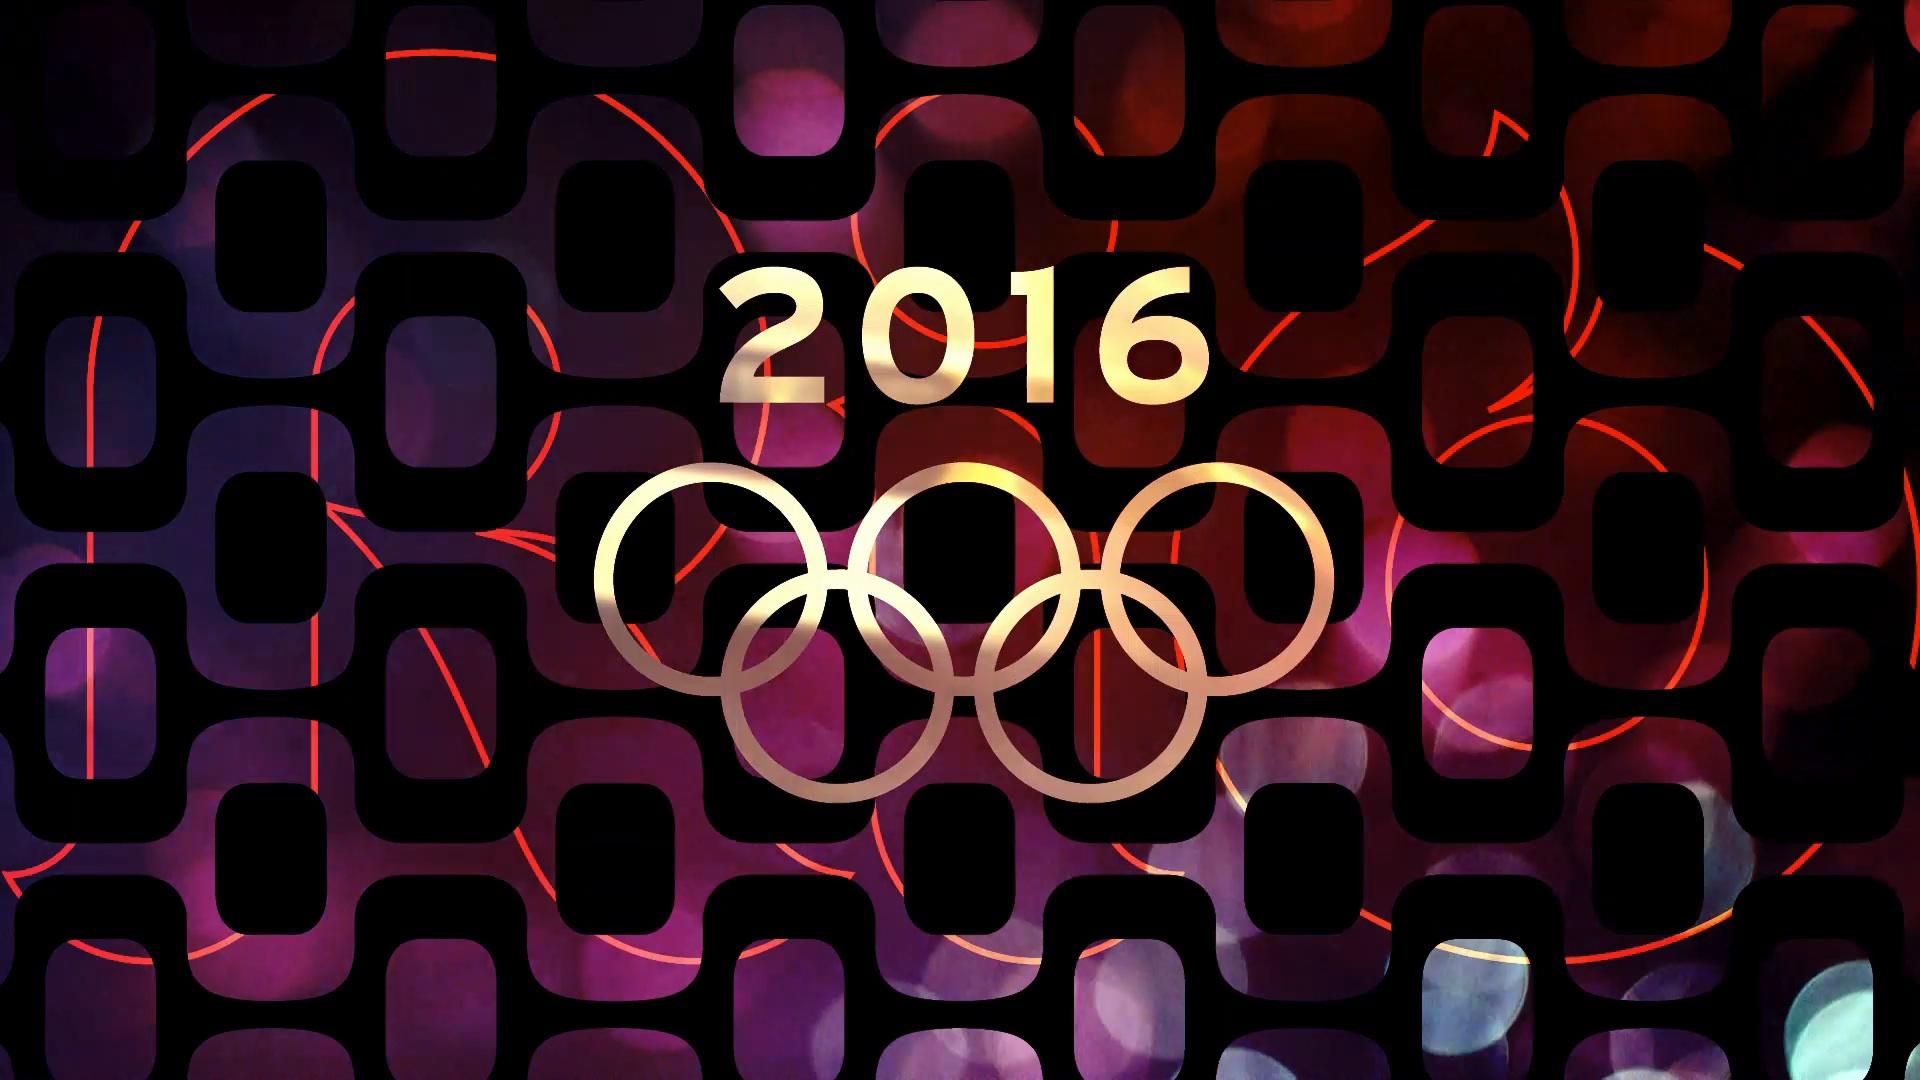 motion graphic design studio jonberrydesign | Olympic Late Night